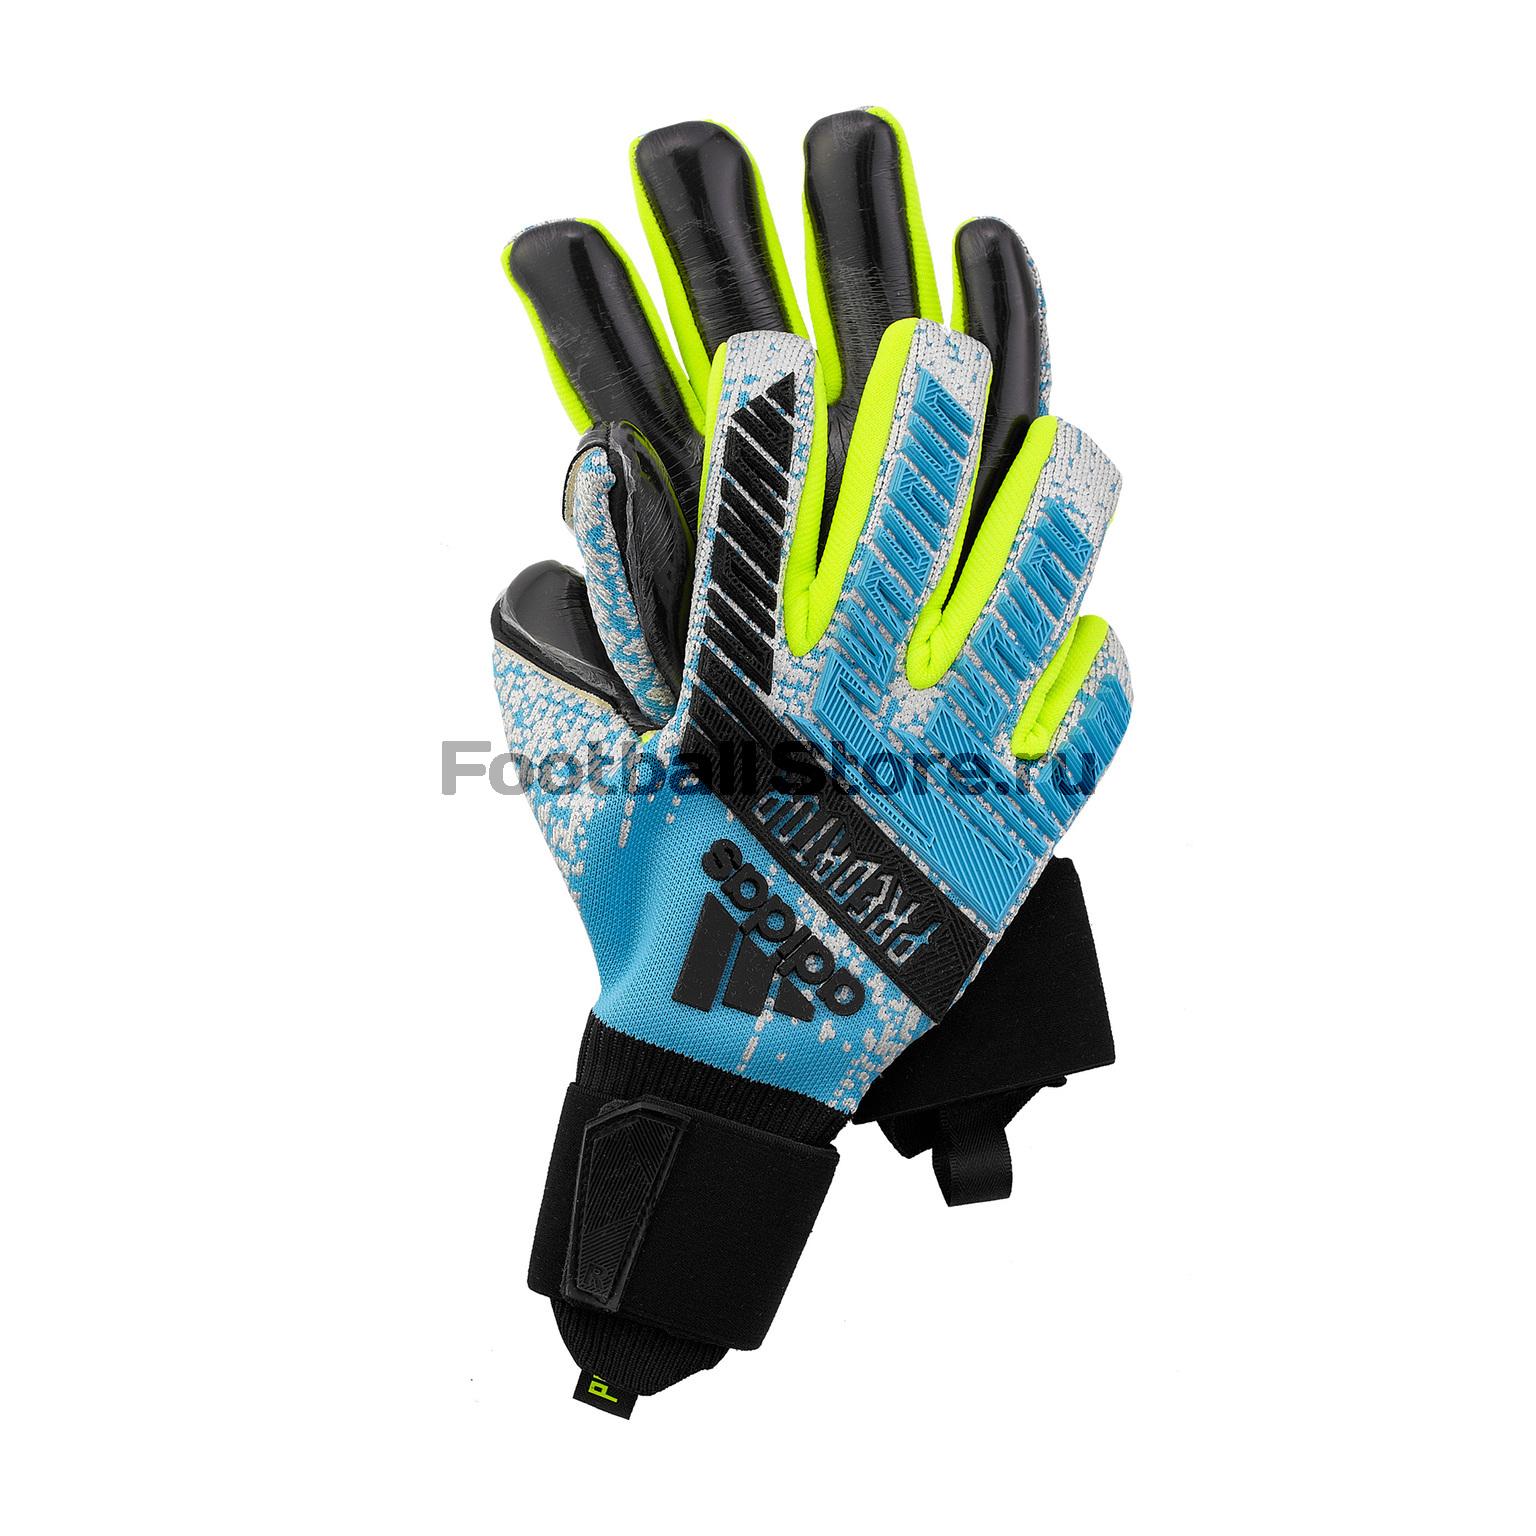 Перчатки вратарские Adidas Predator Pro DY2595 цена